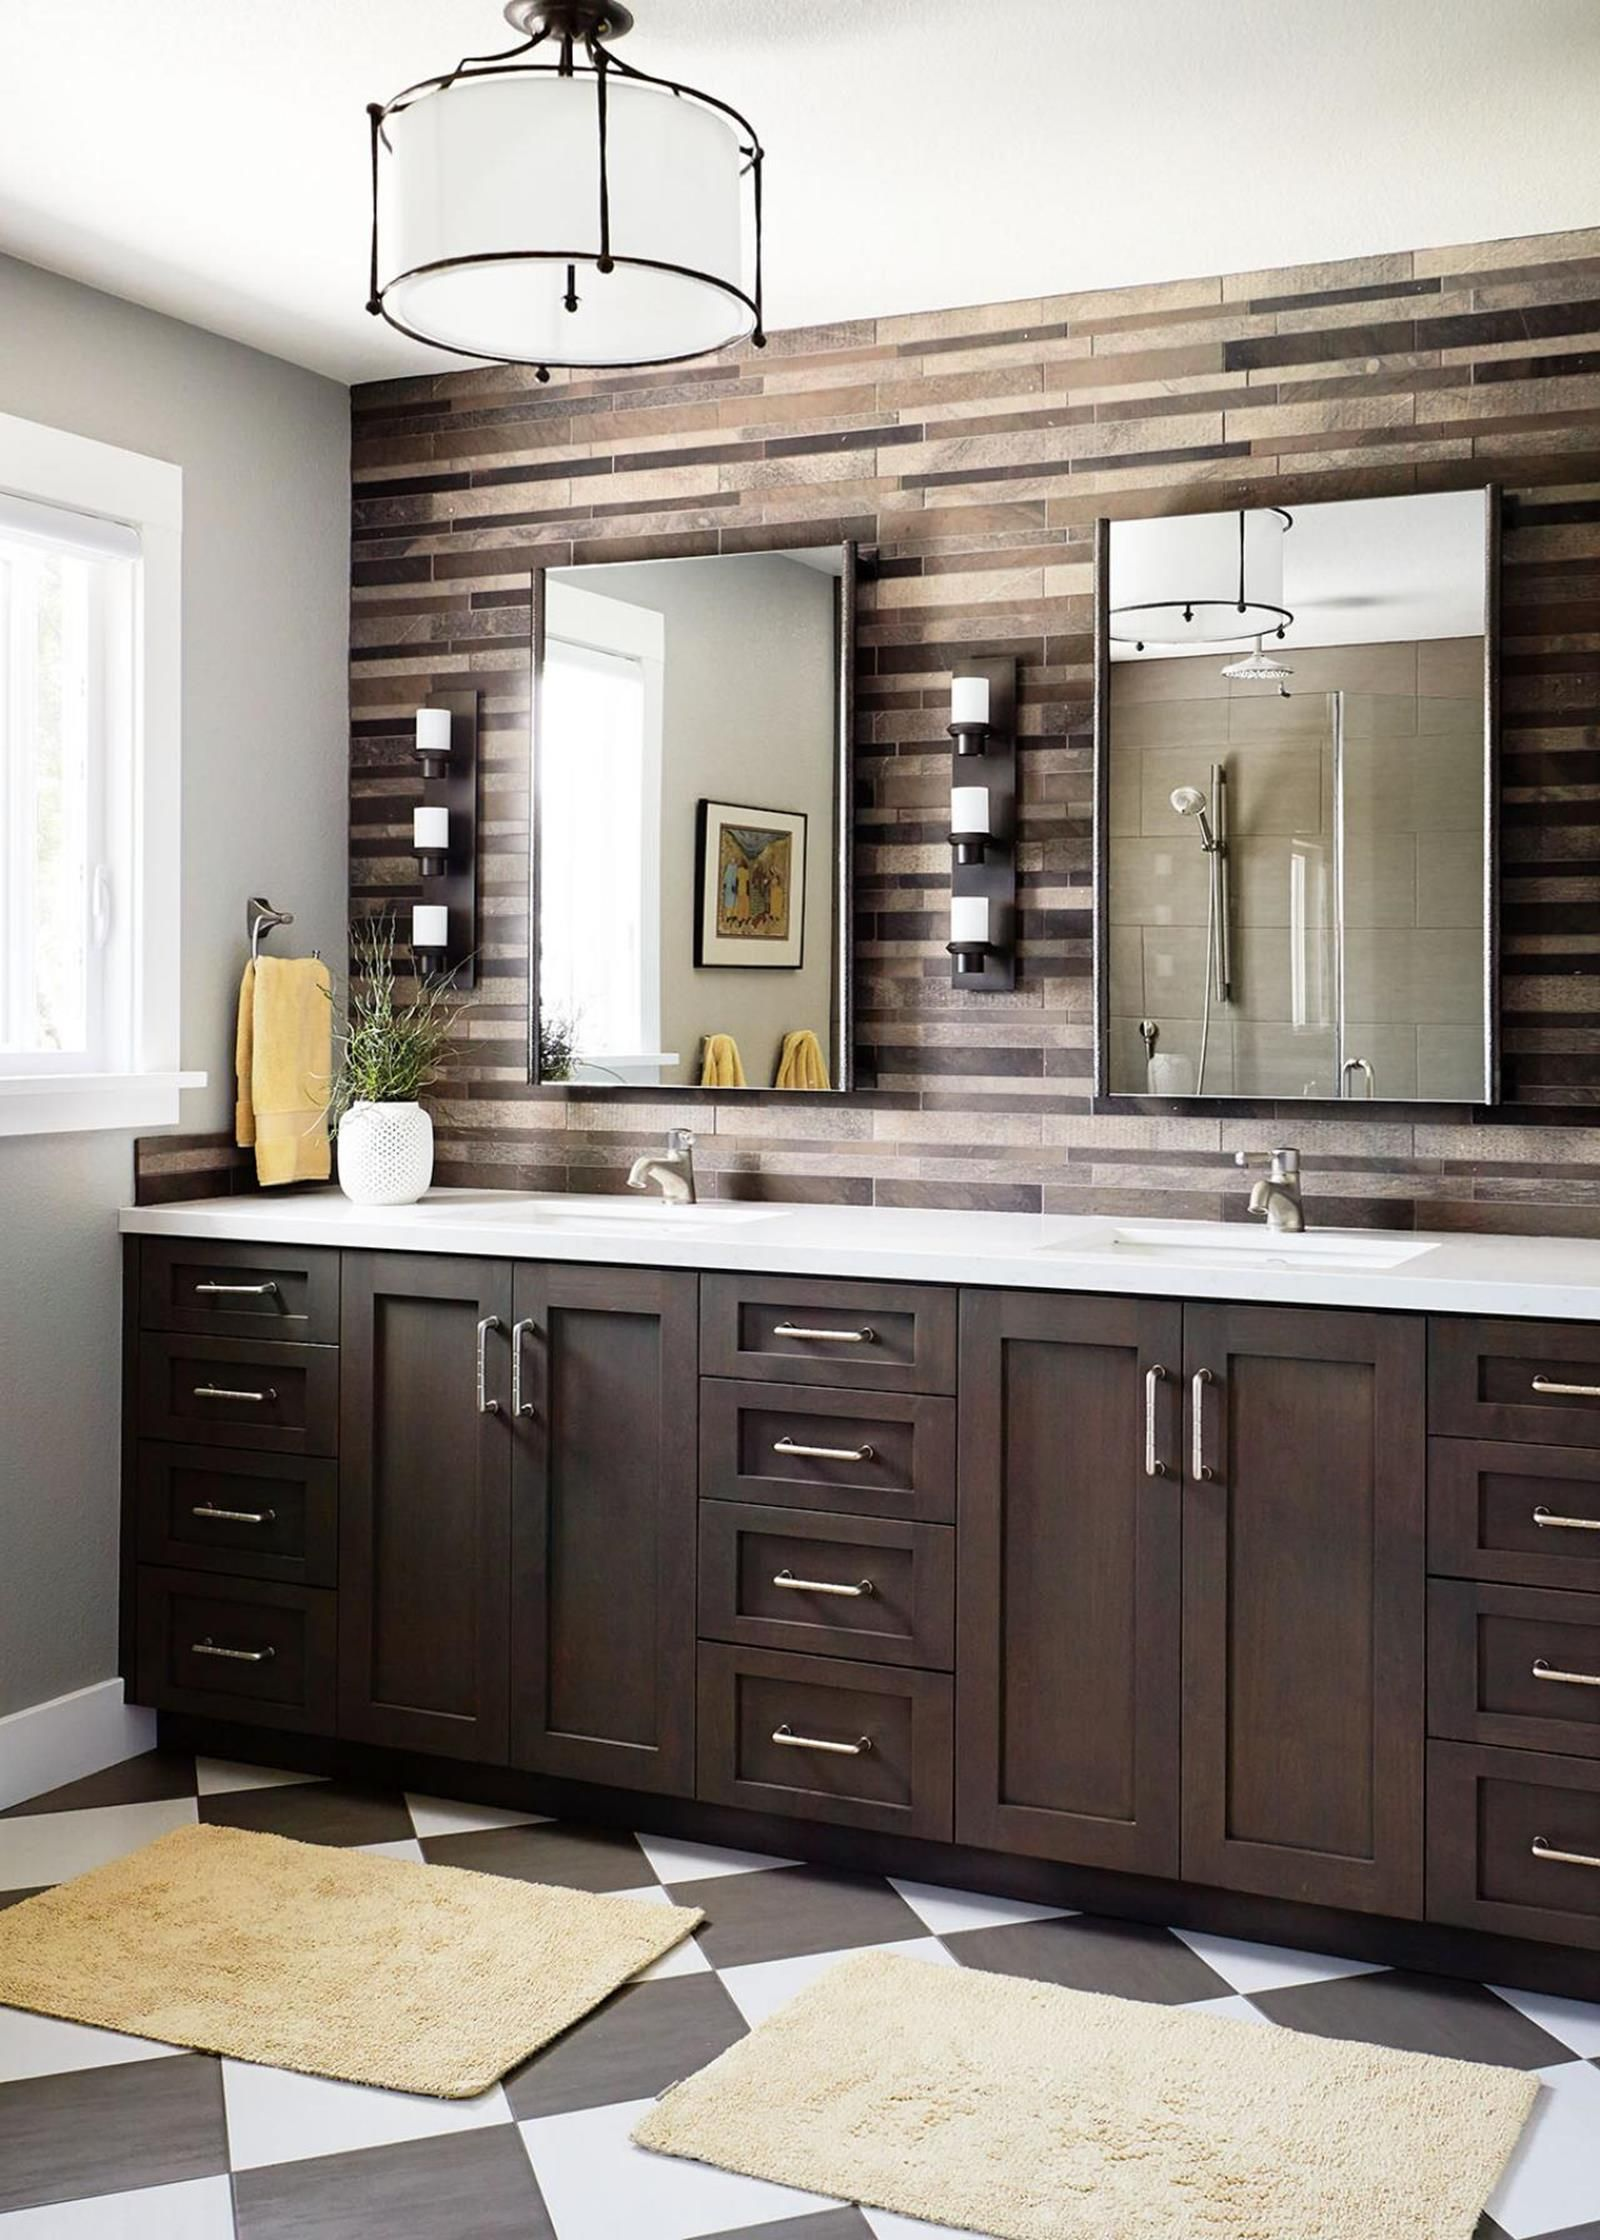 Grey Bathroom Vanity Backsplash Ideas 24 Remodel Rustic Master Bathroom Dark Wood Bathroom Wood Bathroom